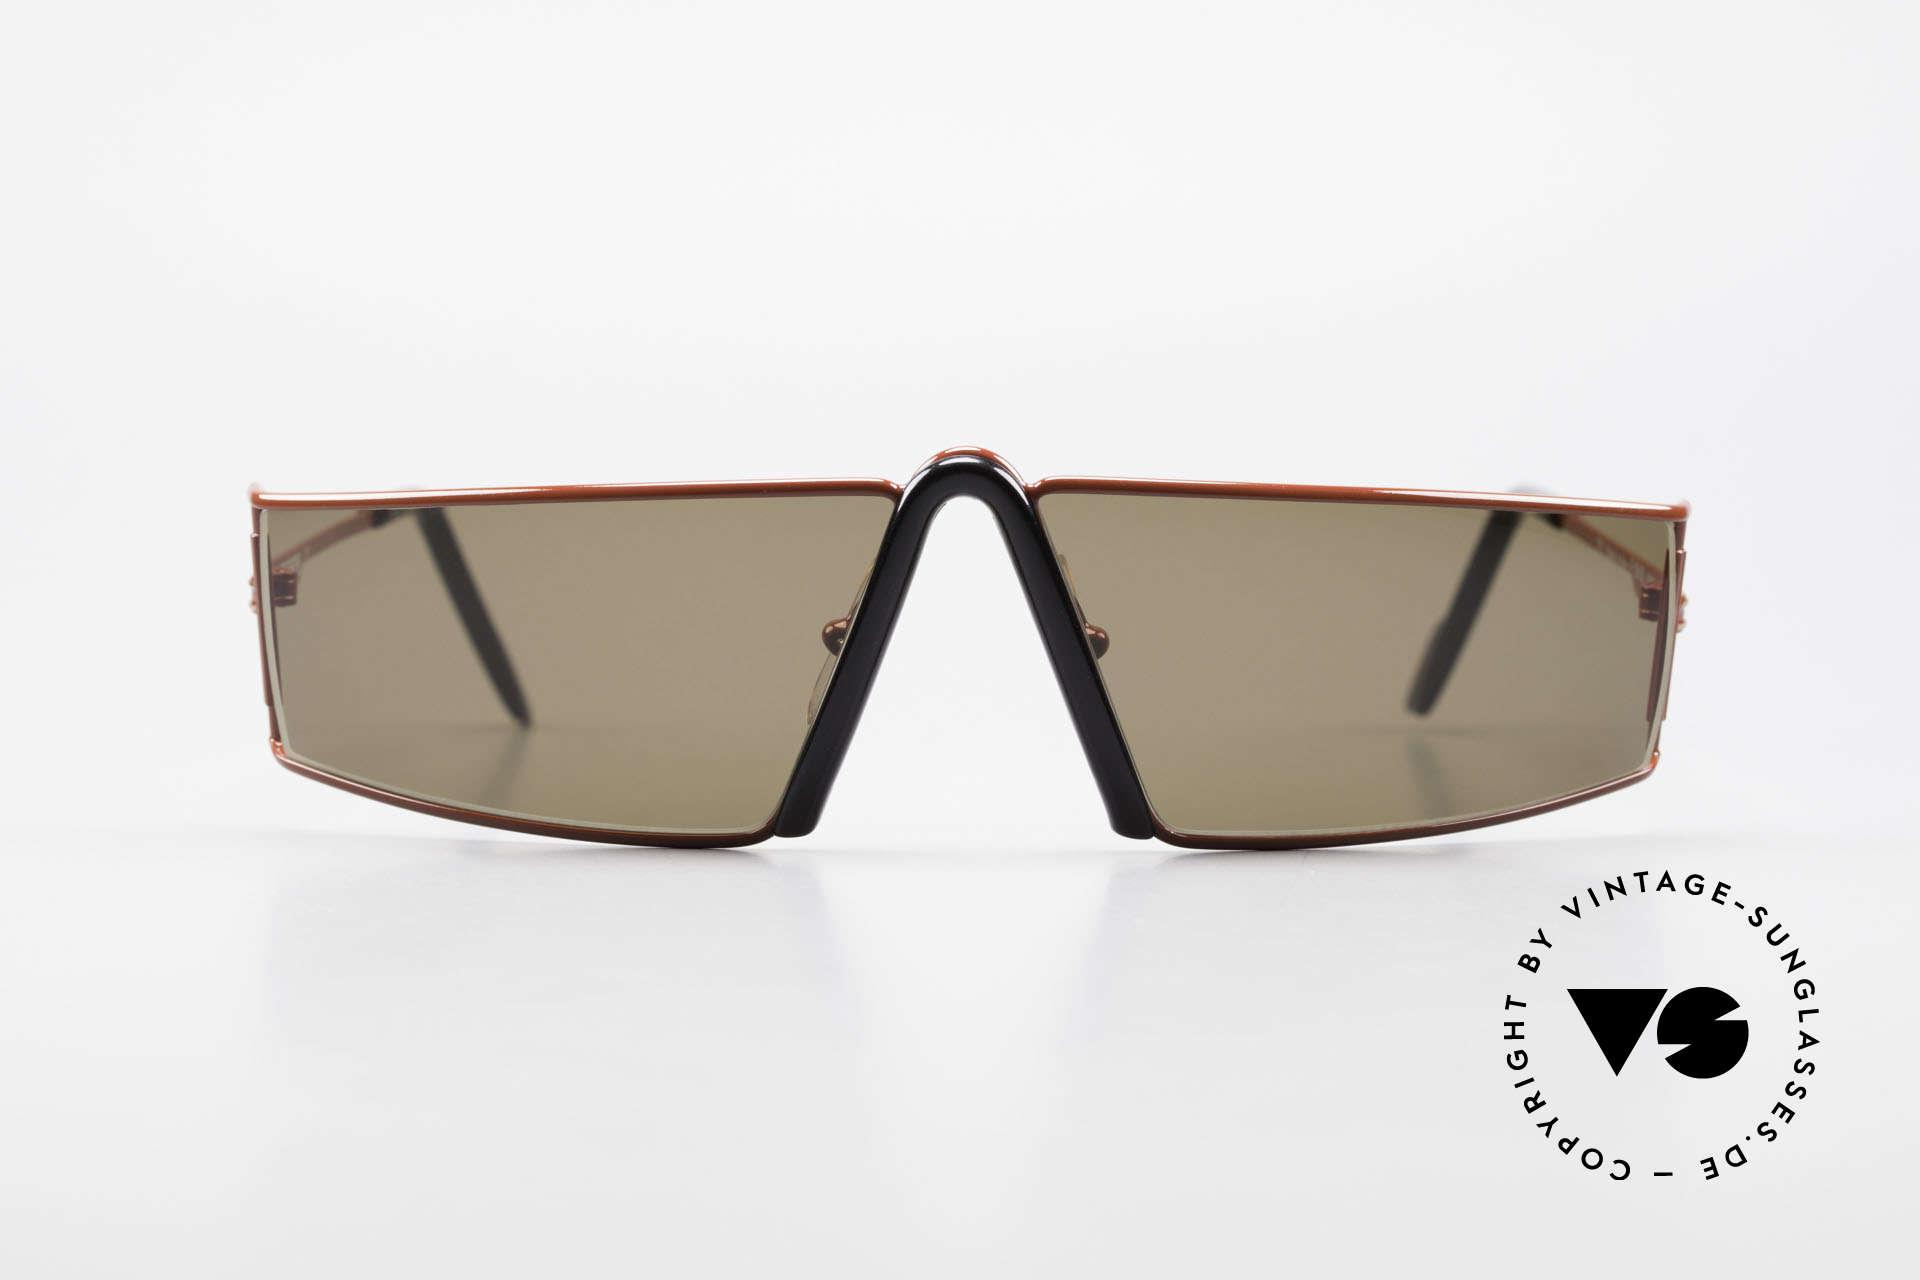 Ferrari F19/S Shades Like XL Reading Glasses, shades are designed like oversized reading glasses, Made for Men